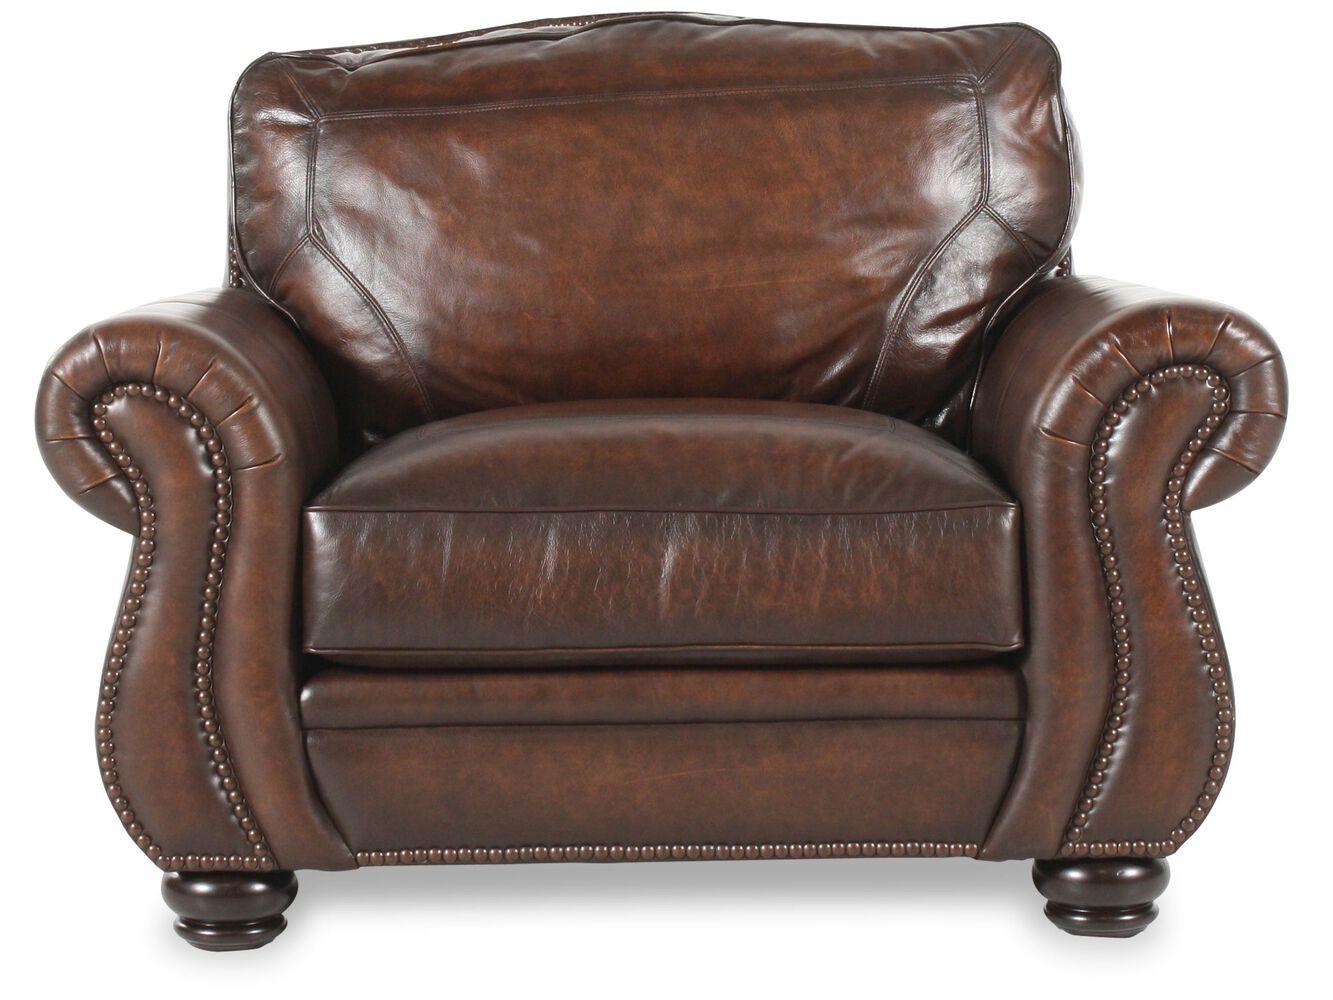 Bernhardt Breckenridge Leather Chair | Mathis Brothers Furniture